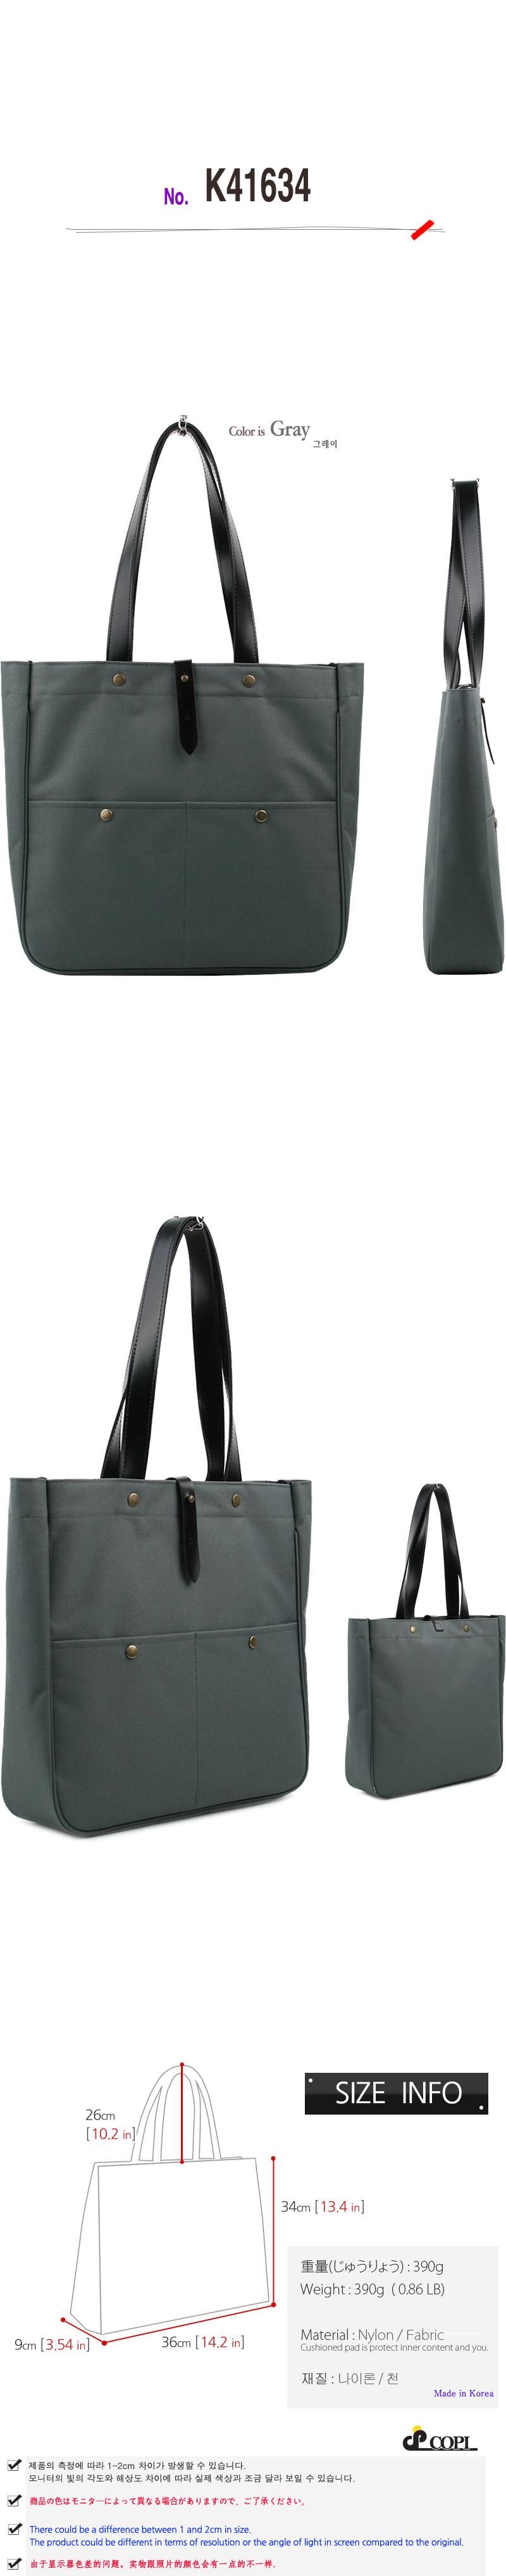 Shoulder&tote bag no.K41634view